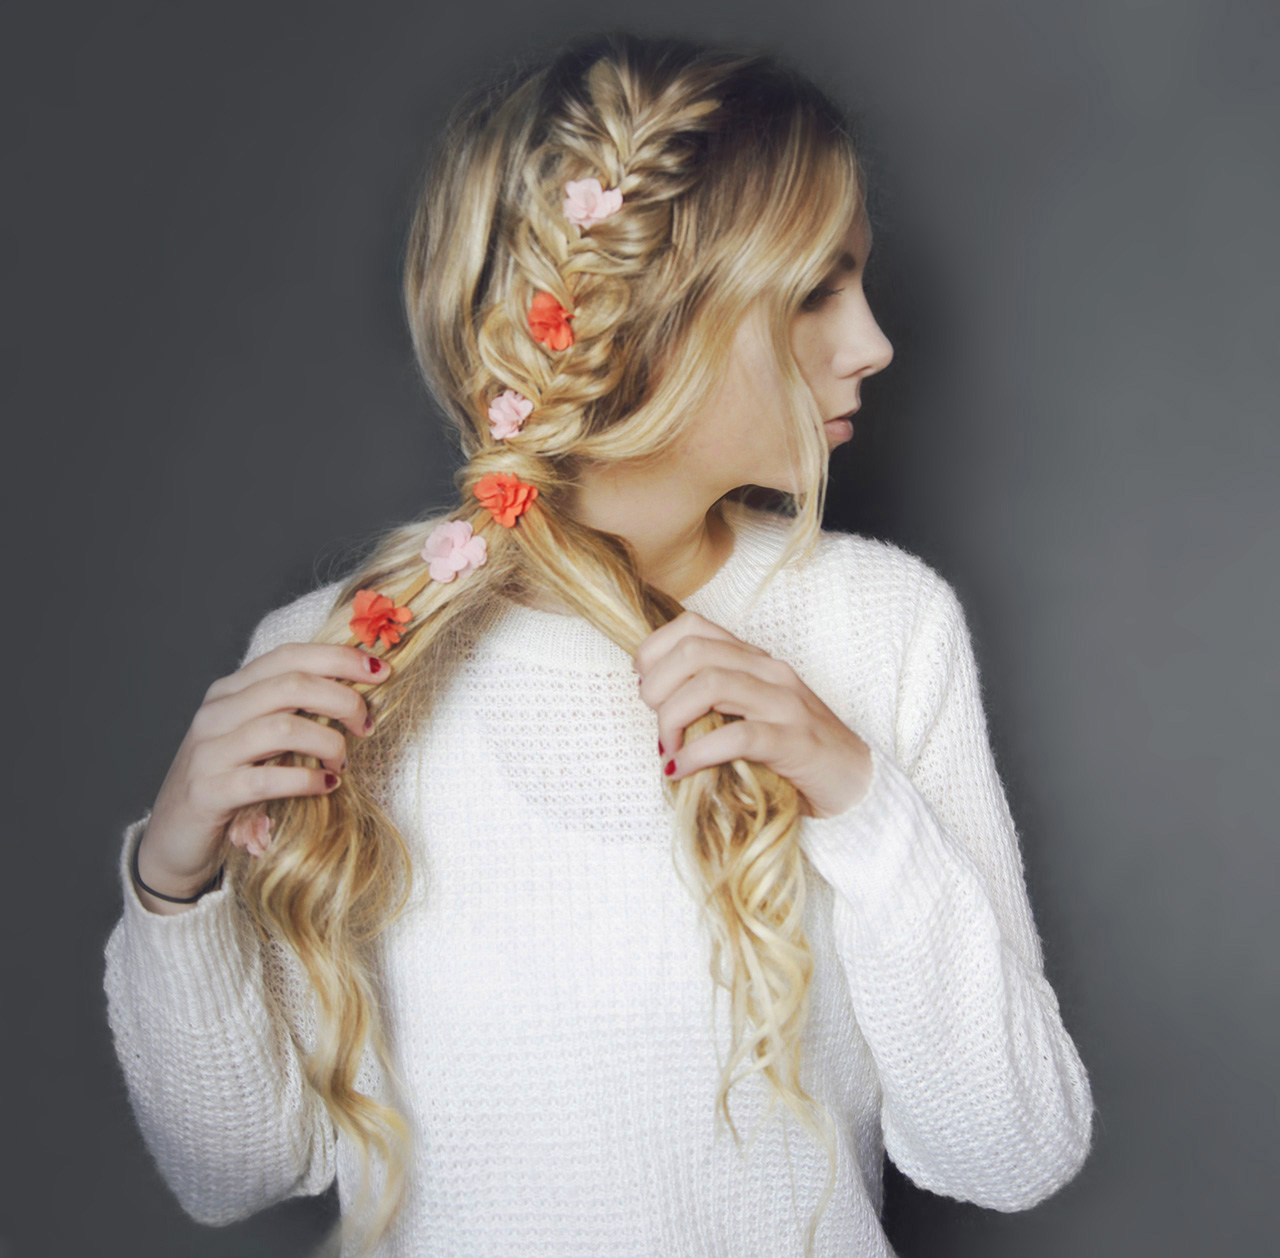 kassinka-flower-child-hair-product copy